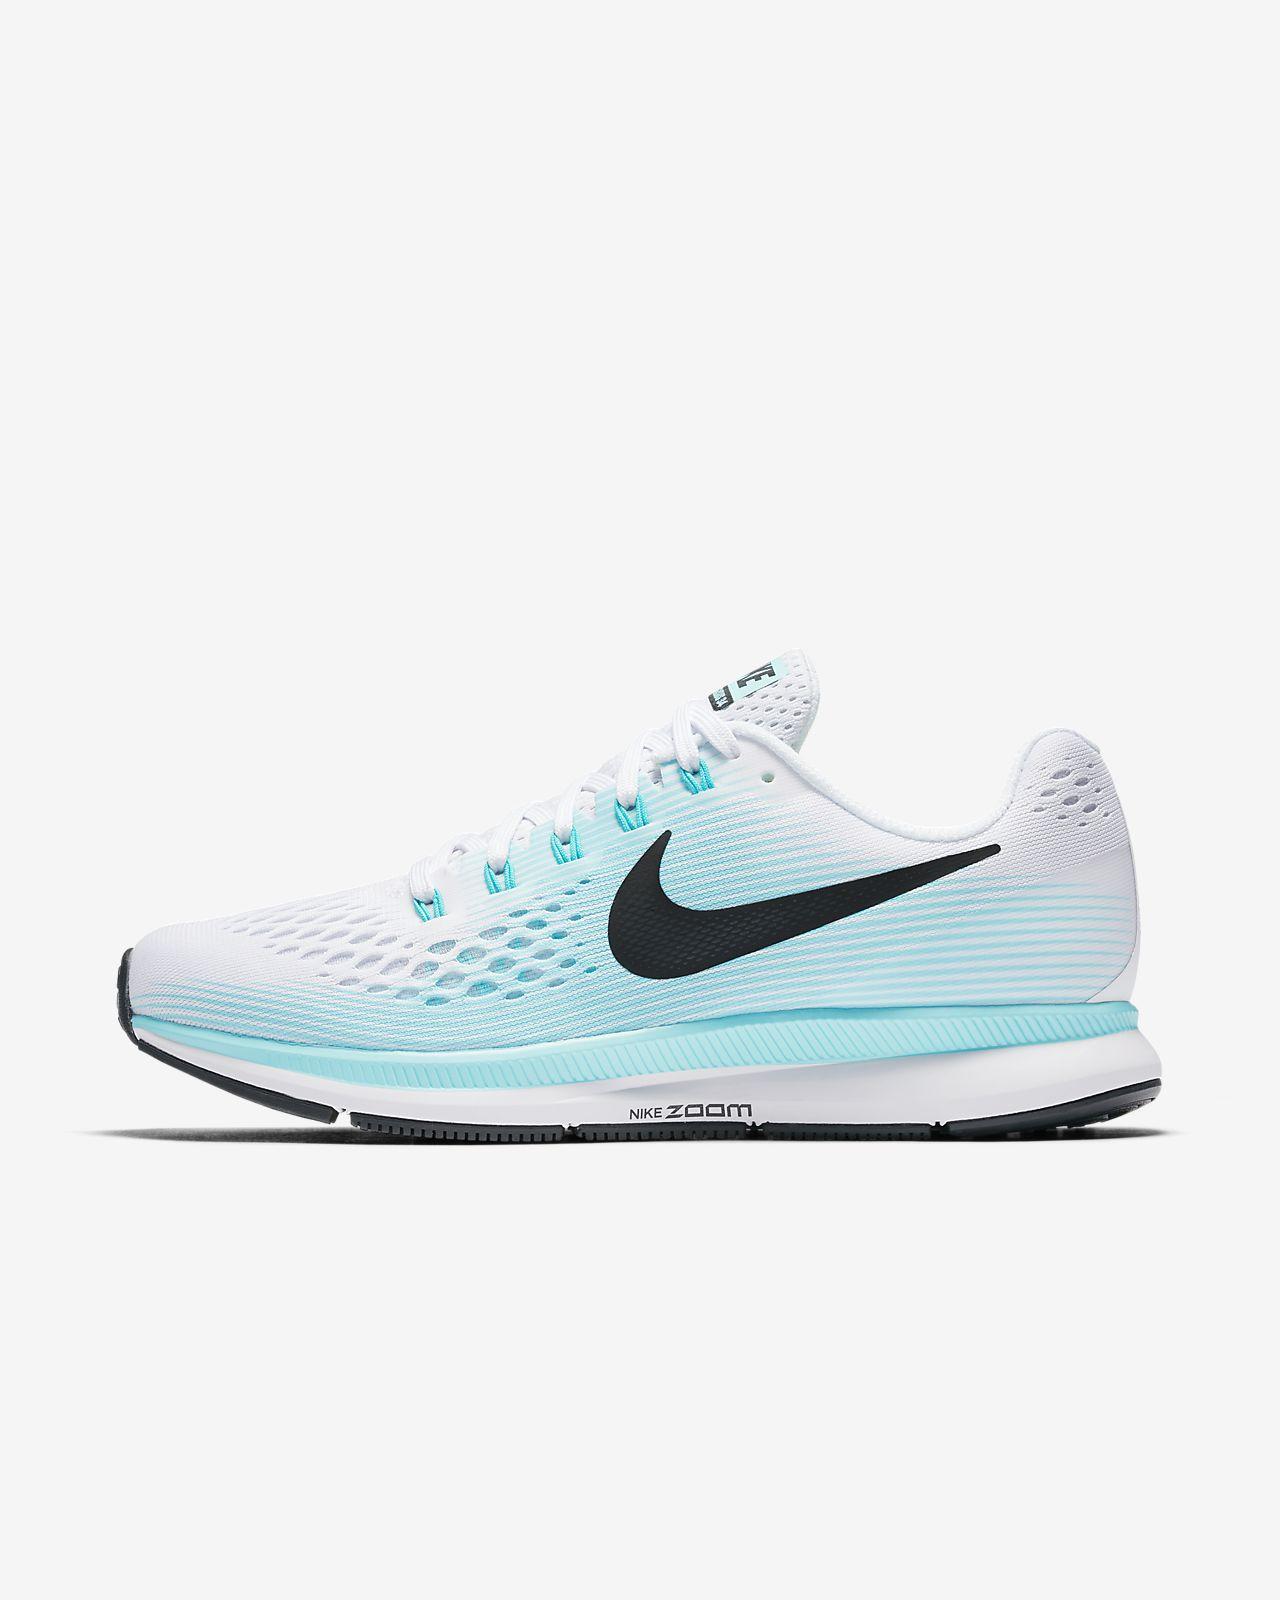 ... Chaussure de running Nike Air Zoom Pegasus 34 pour Femme